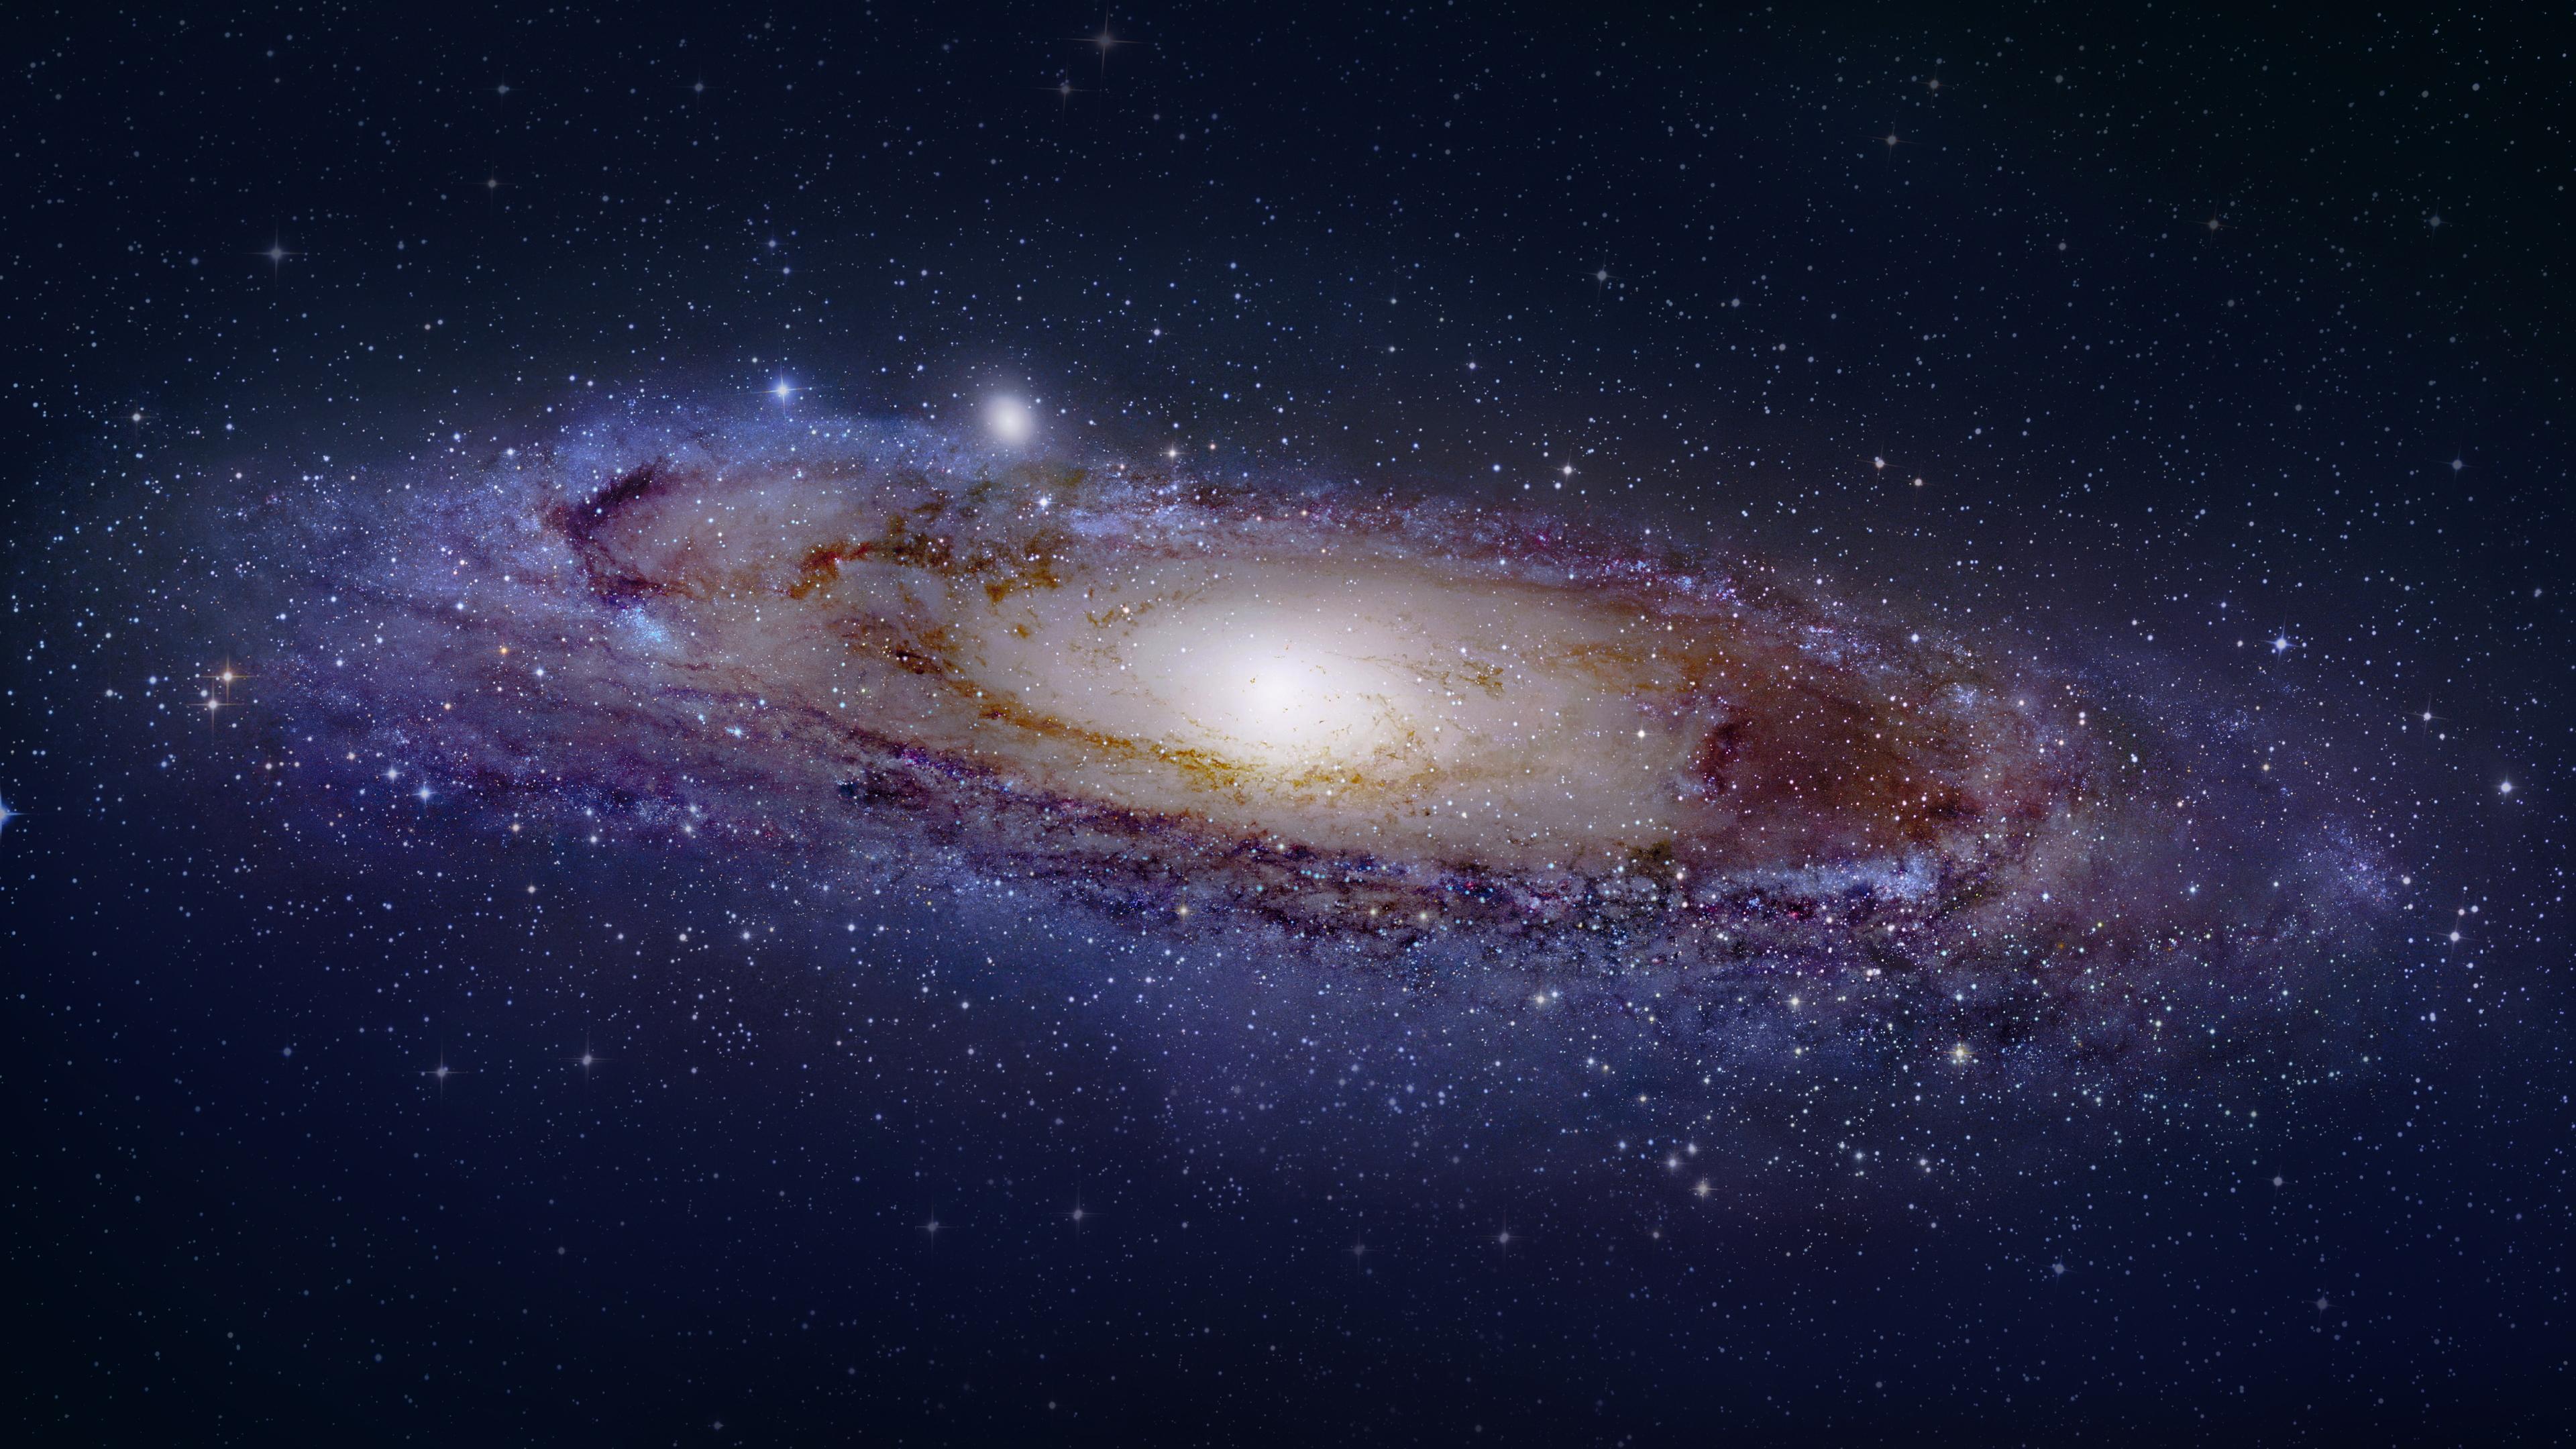 galaxy-space-universe-andromeda-stars-og.jpg